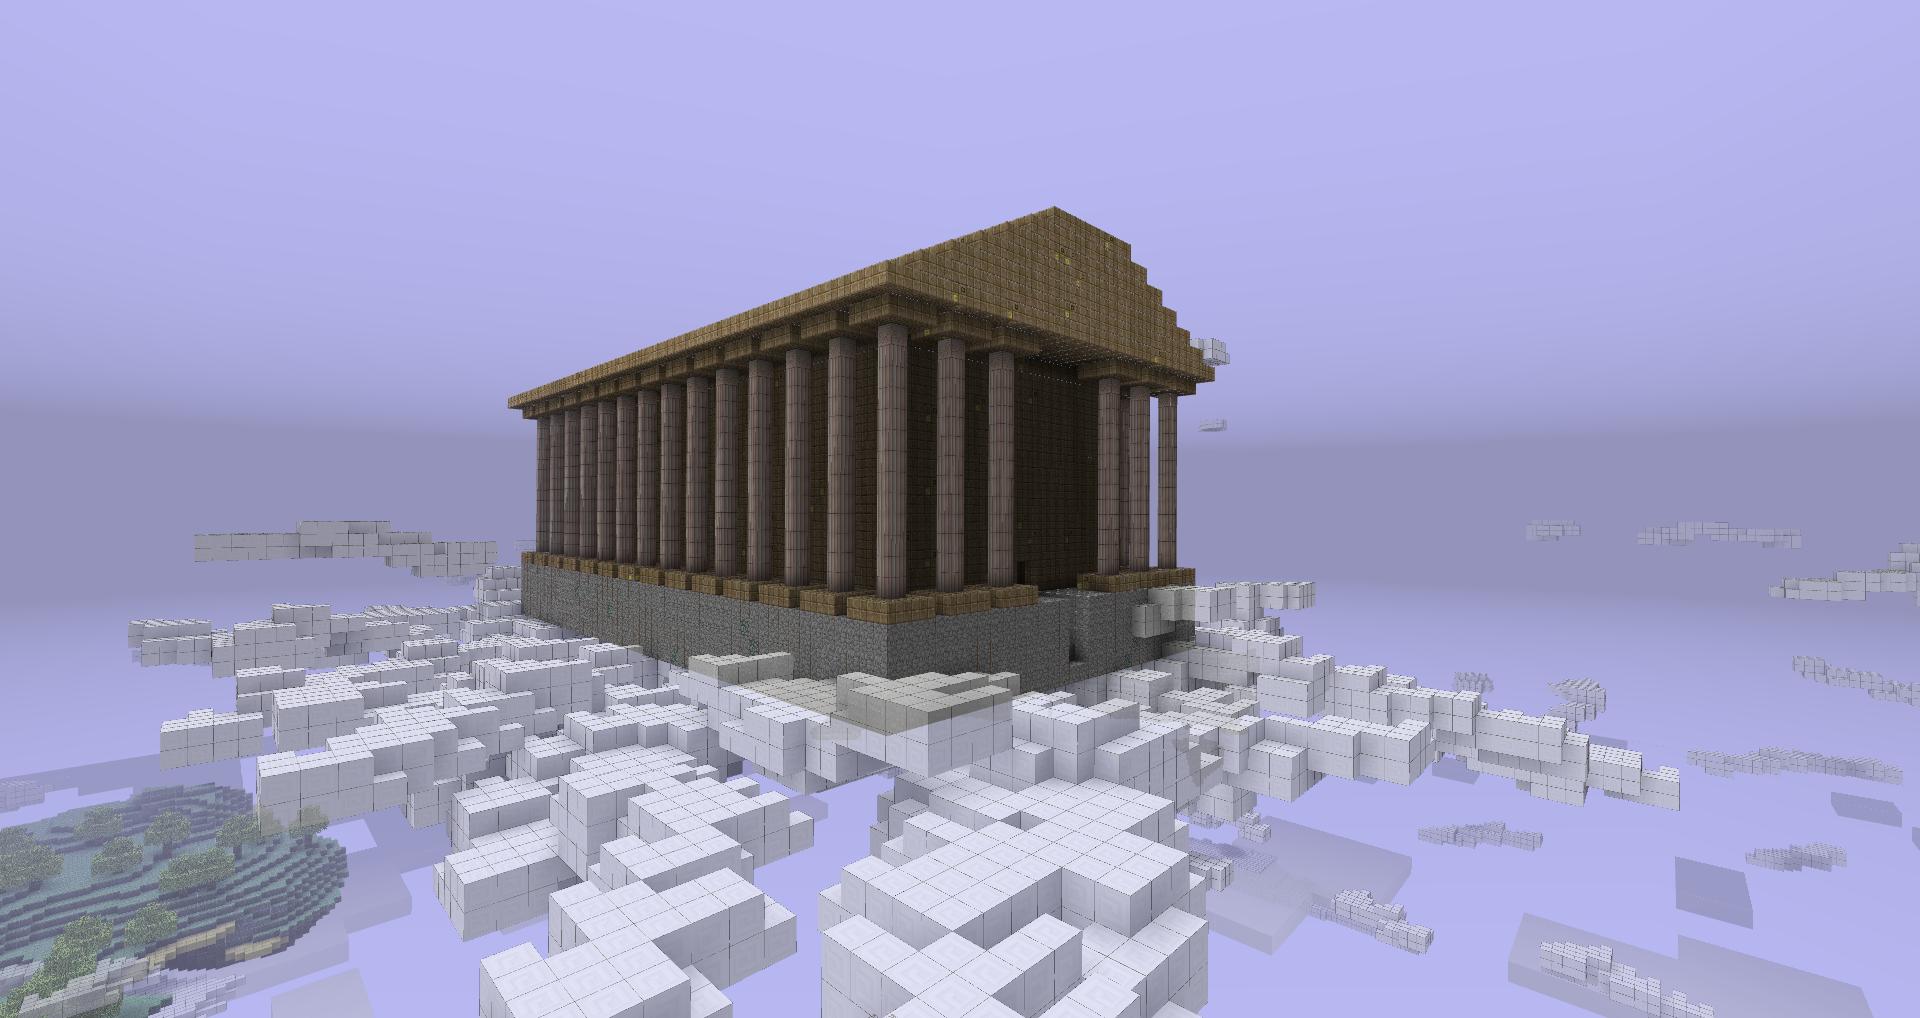 Minecraft Modernes Haus Bauen X Tutorial Anleitung Hd - Minecraft haus ideen anleitung